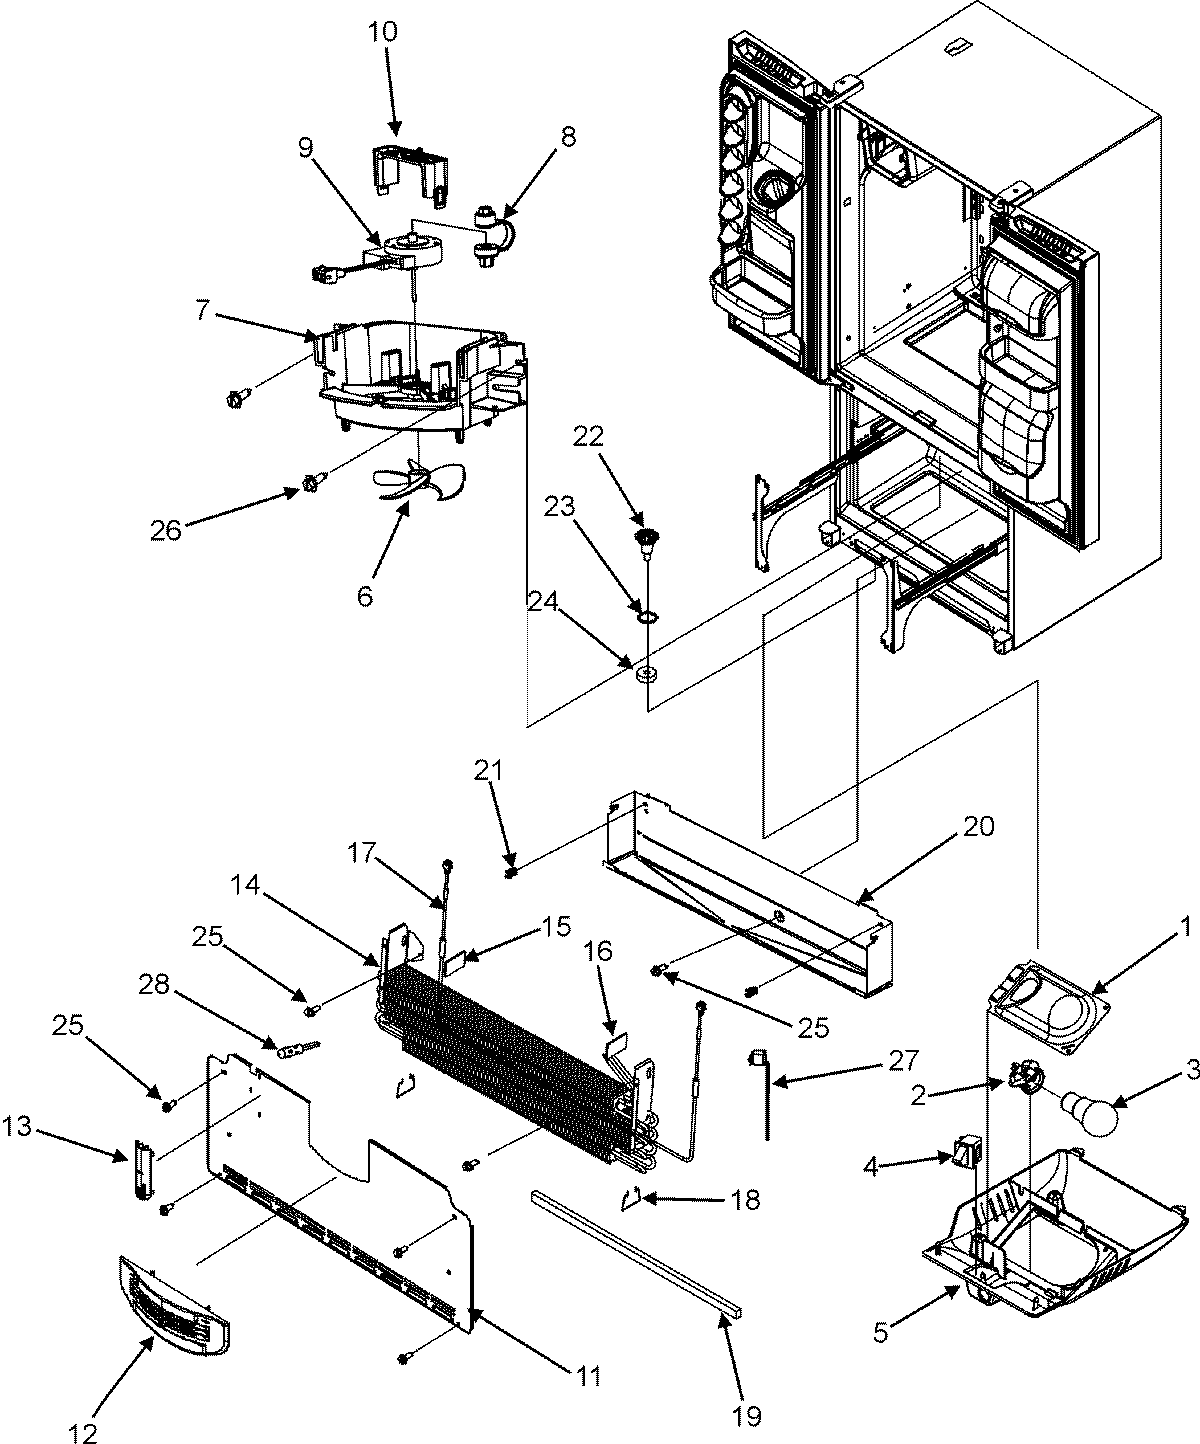 small resolution of defrosting a maytag refrigerator